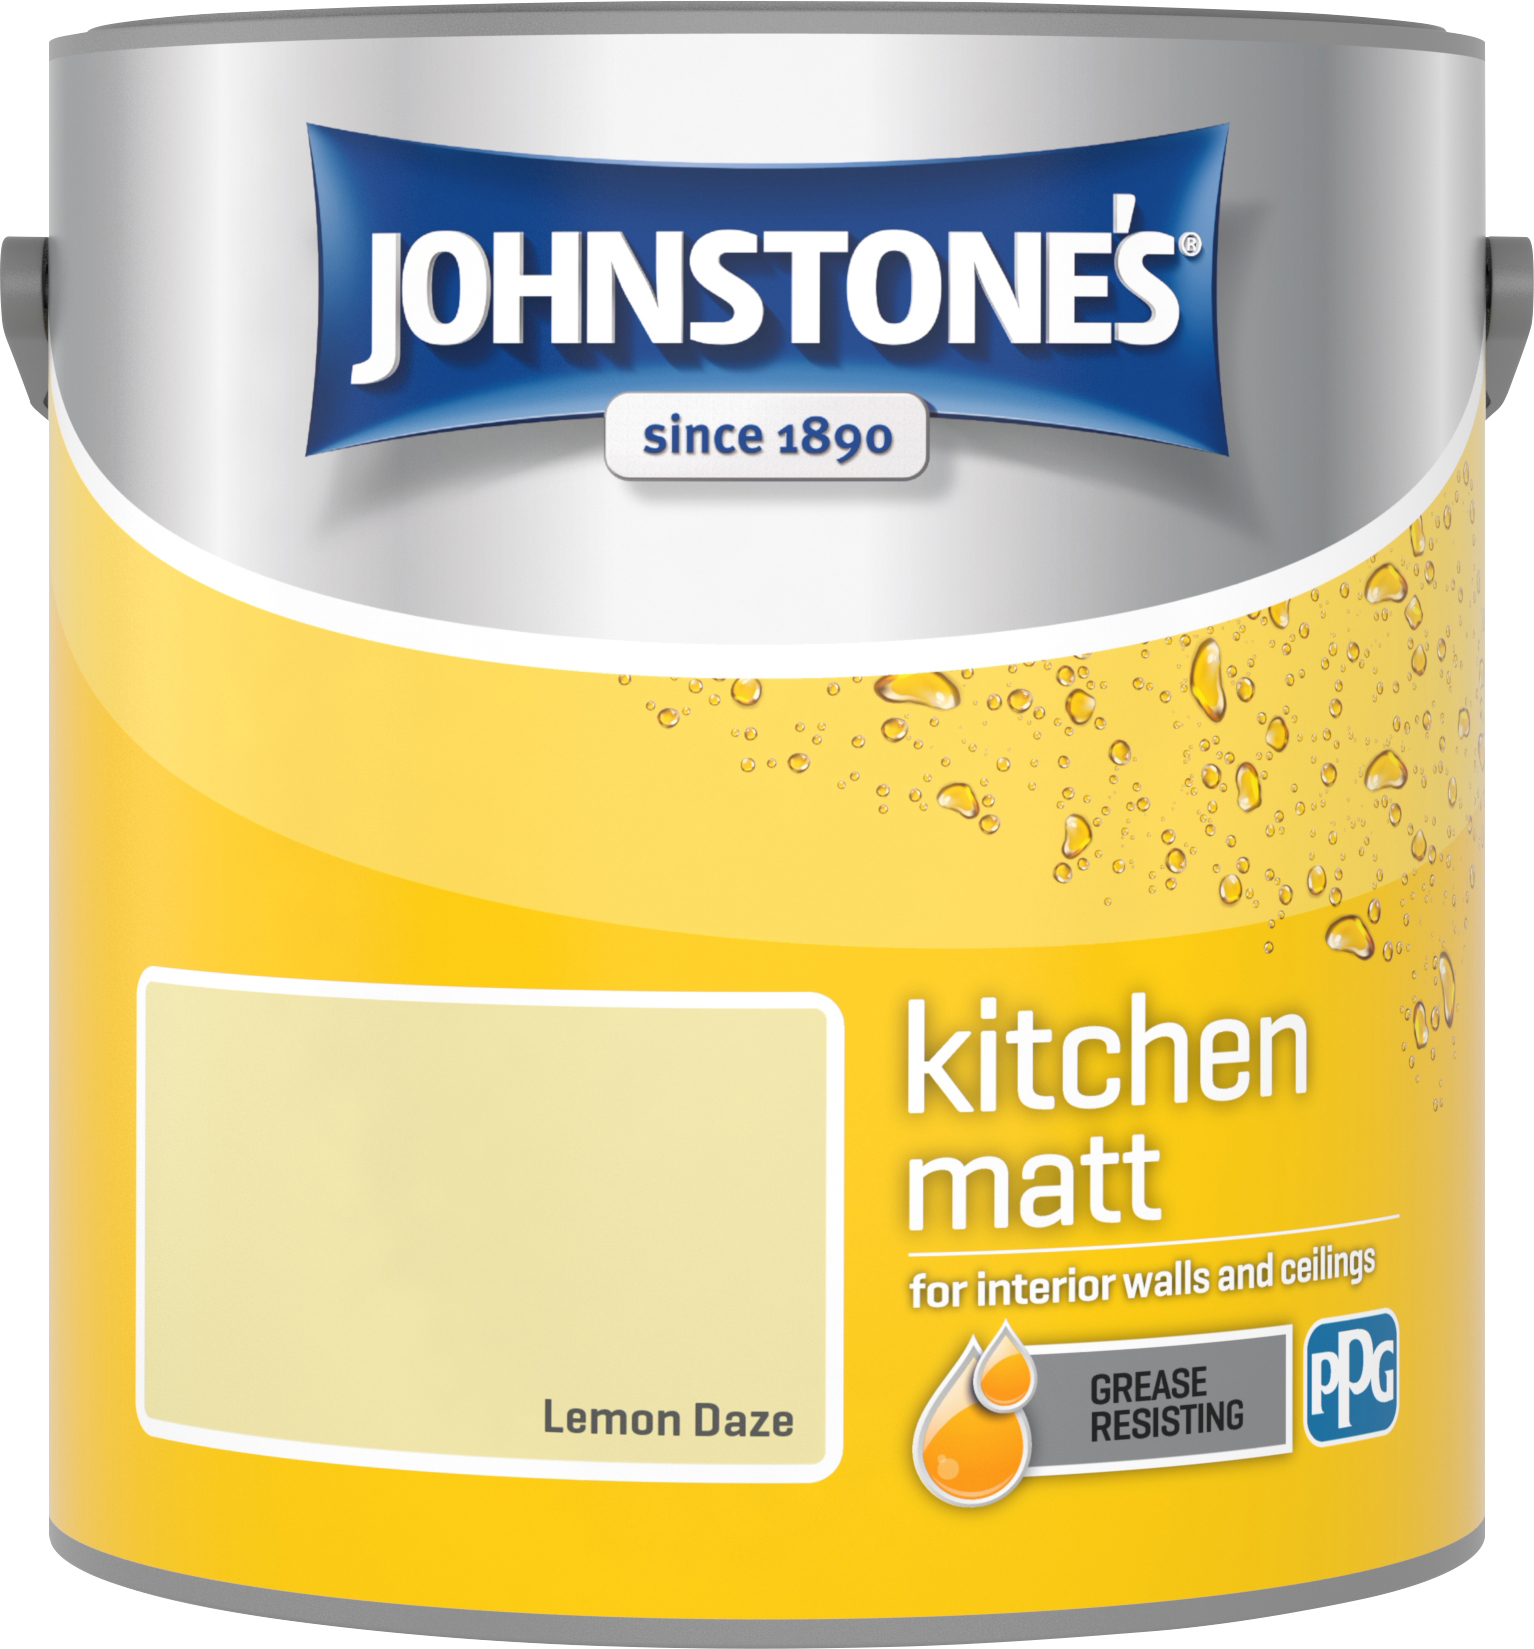 Johnstone's 2.5 Litre Kitchen Paint - Lemon Daze